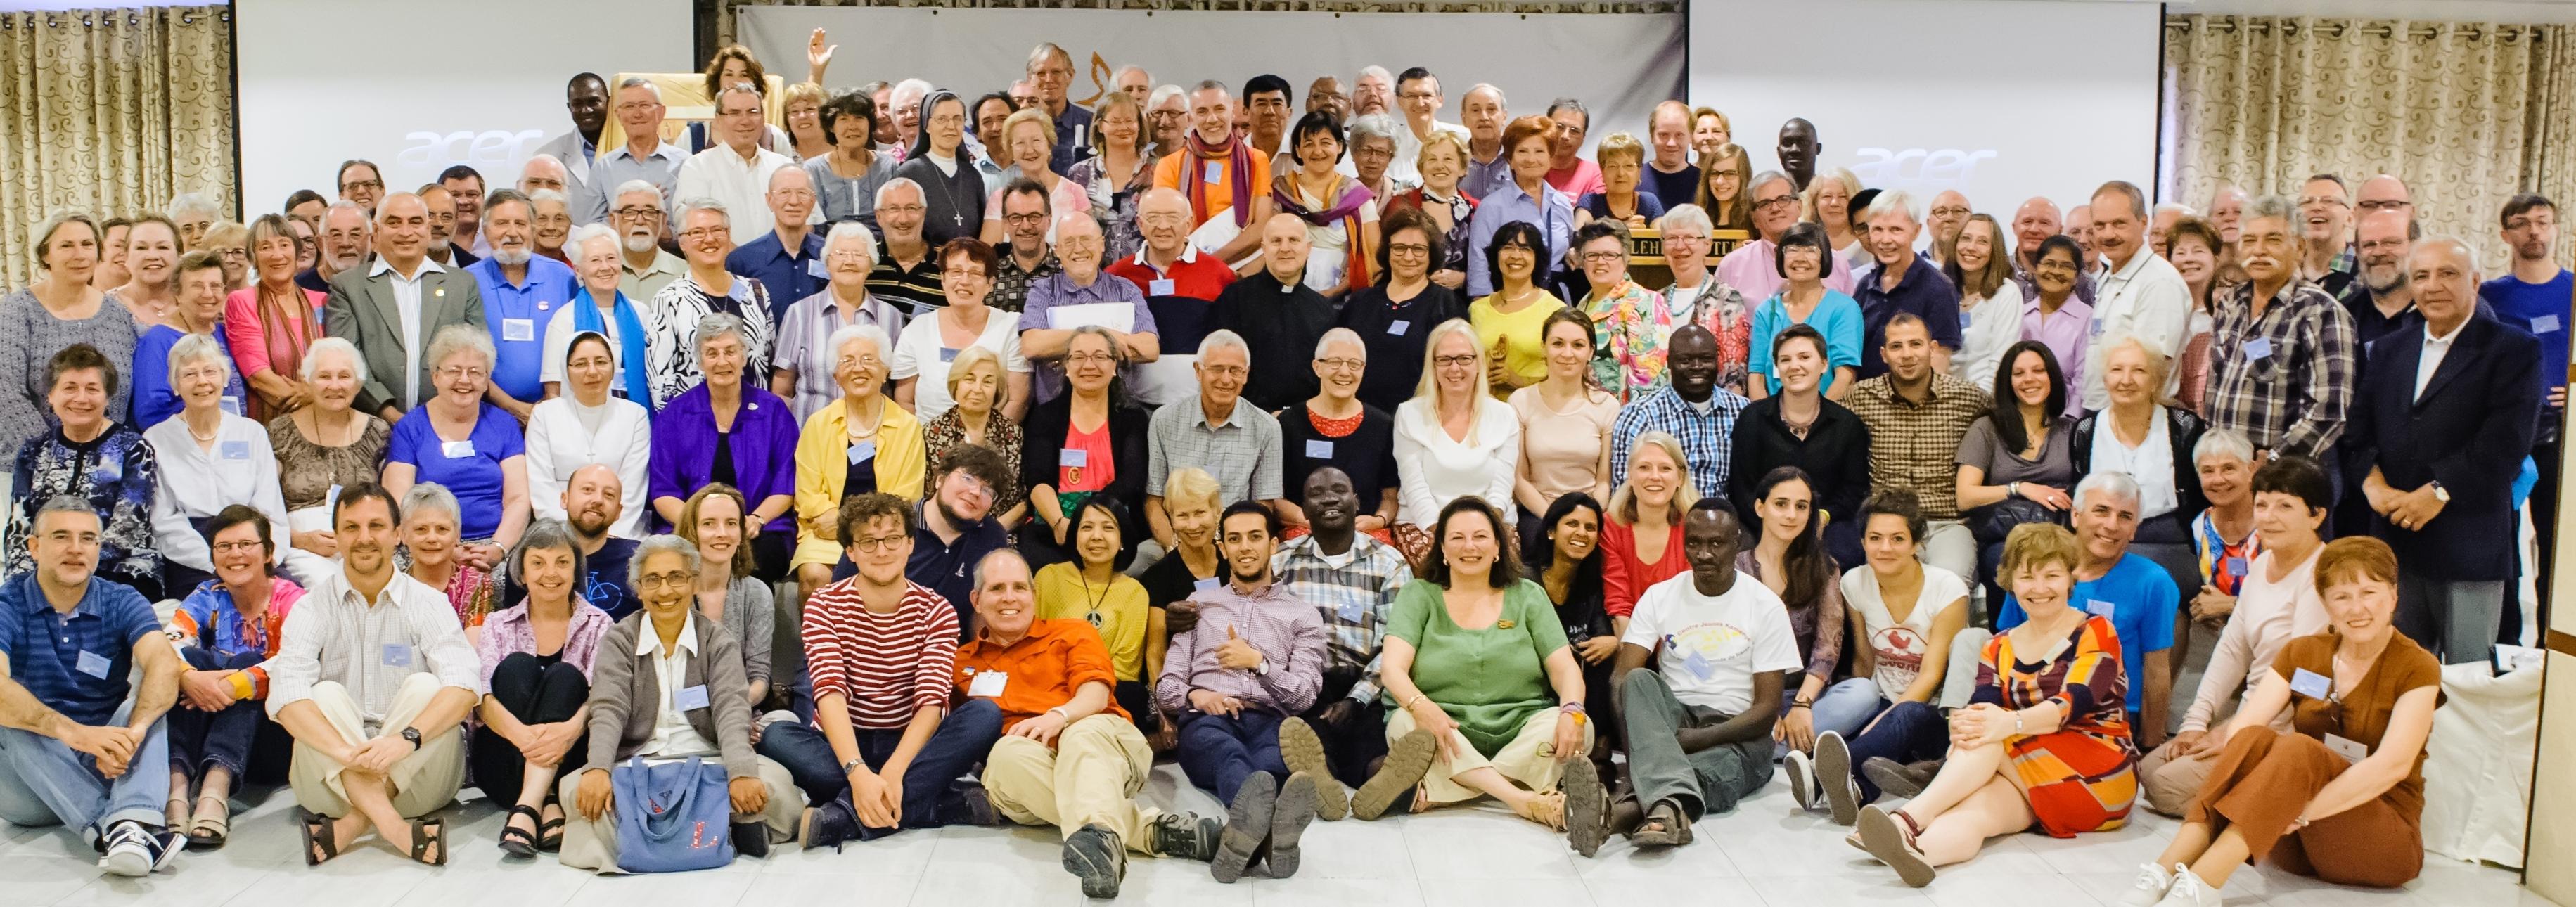 Group Photo - Pax Christi Anniversary Celebration